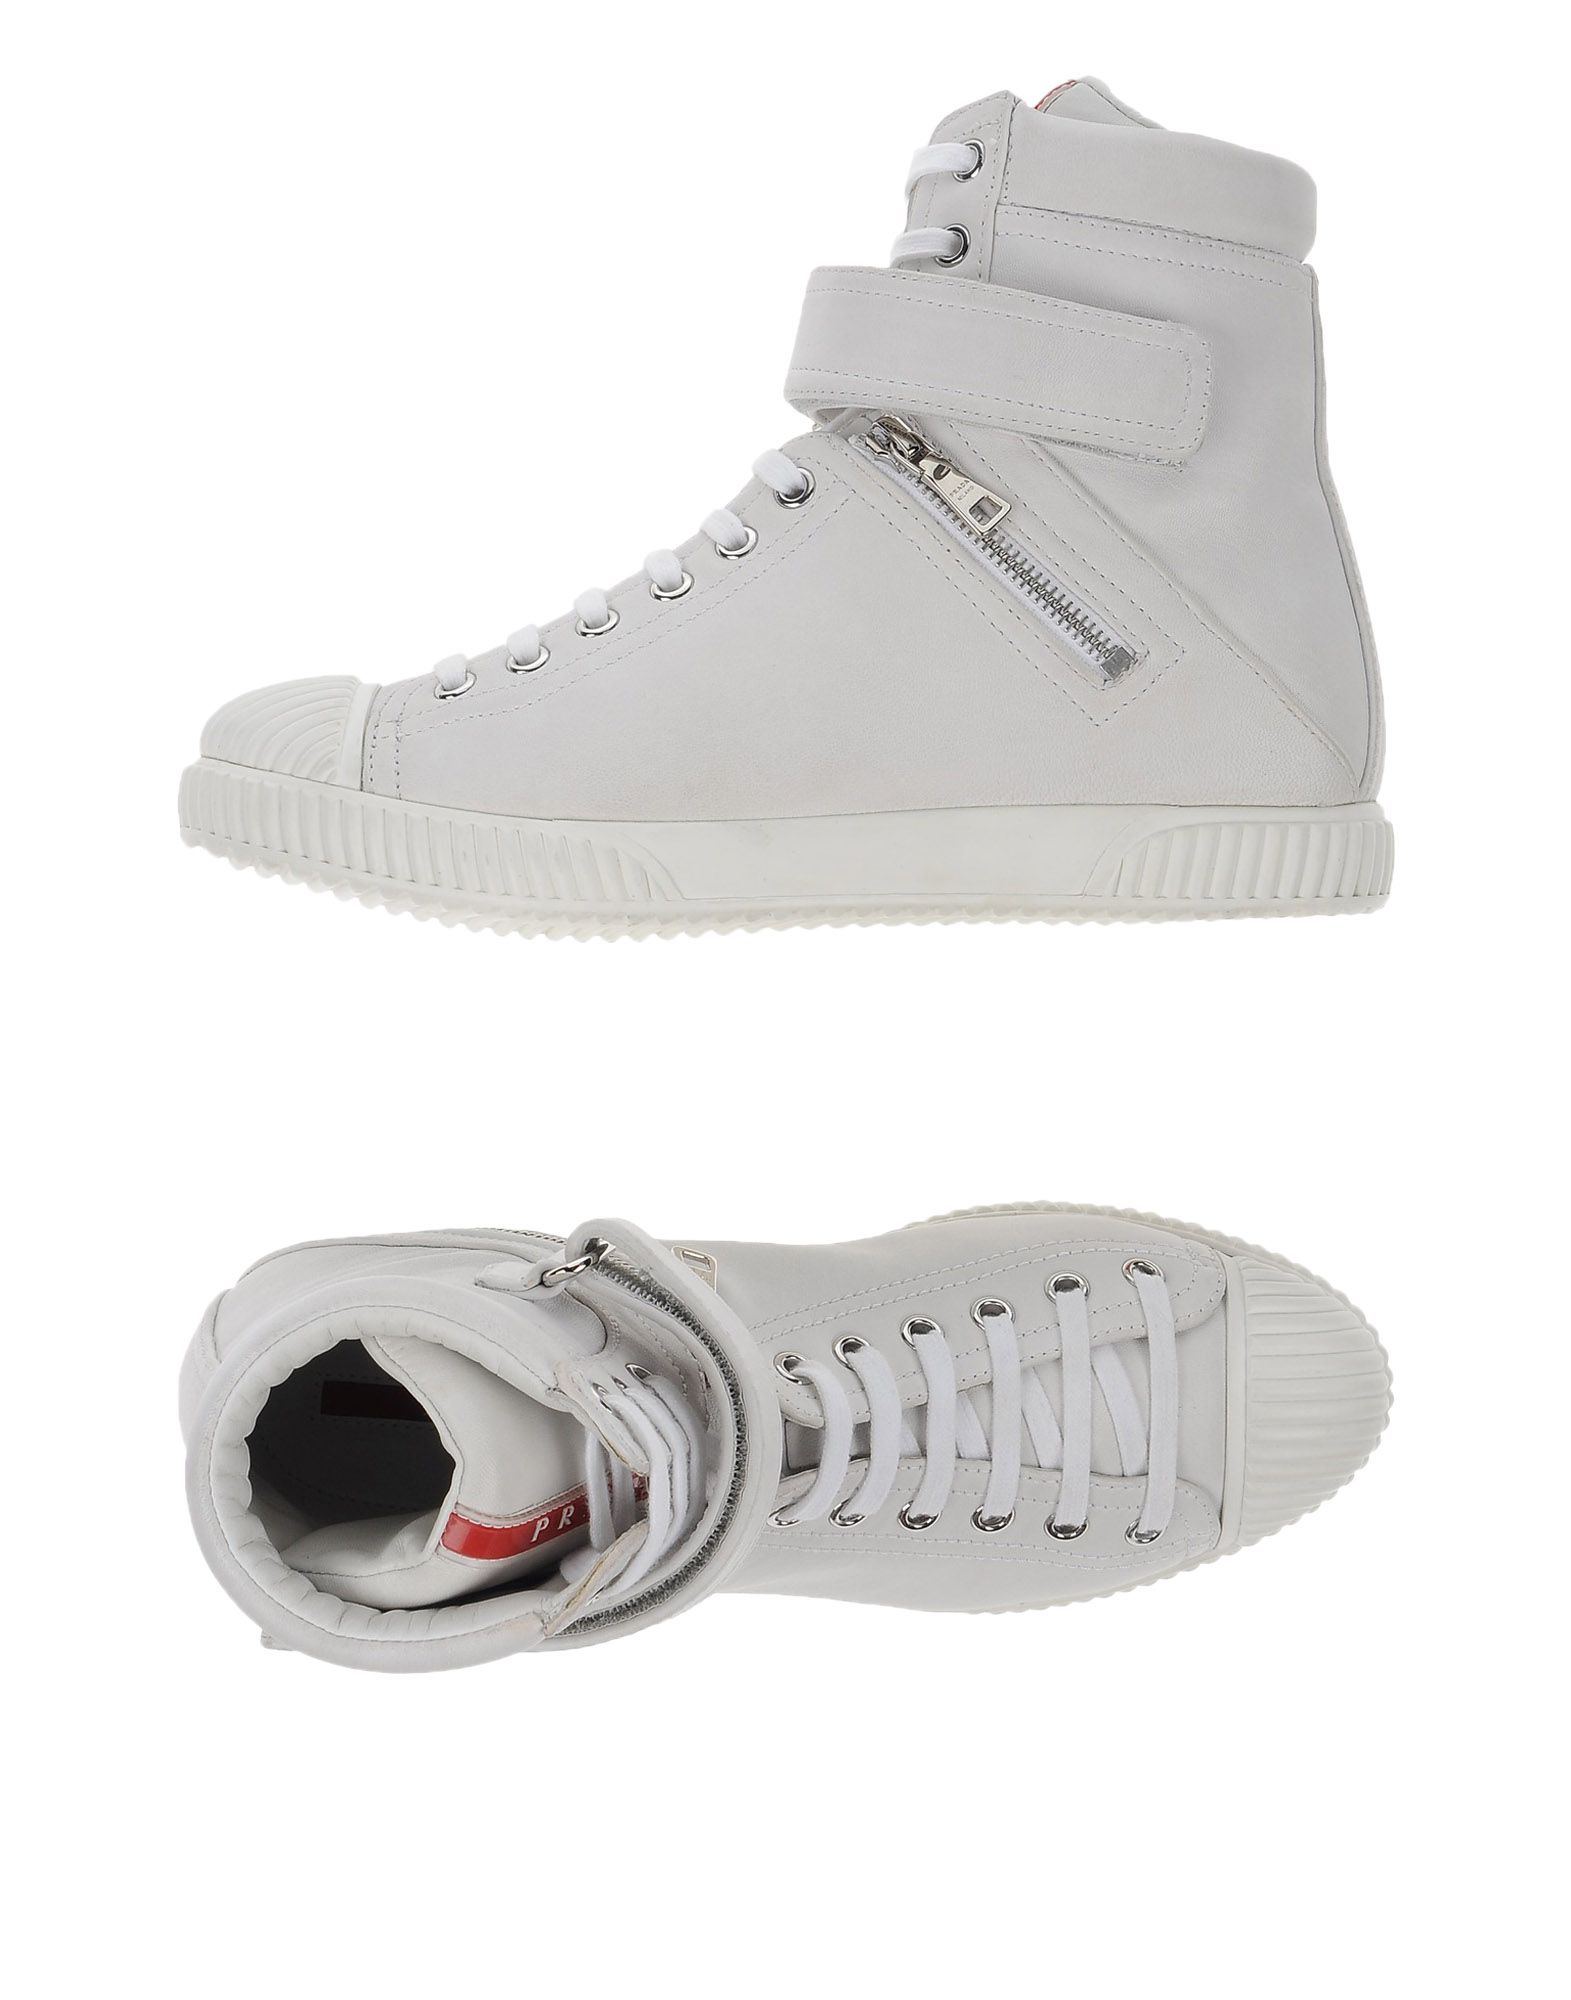 Prada Sport Sneakers Damen Damen Damen  11065504EN Beliebte Schuhe 521096